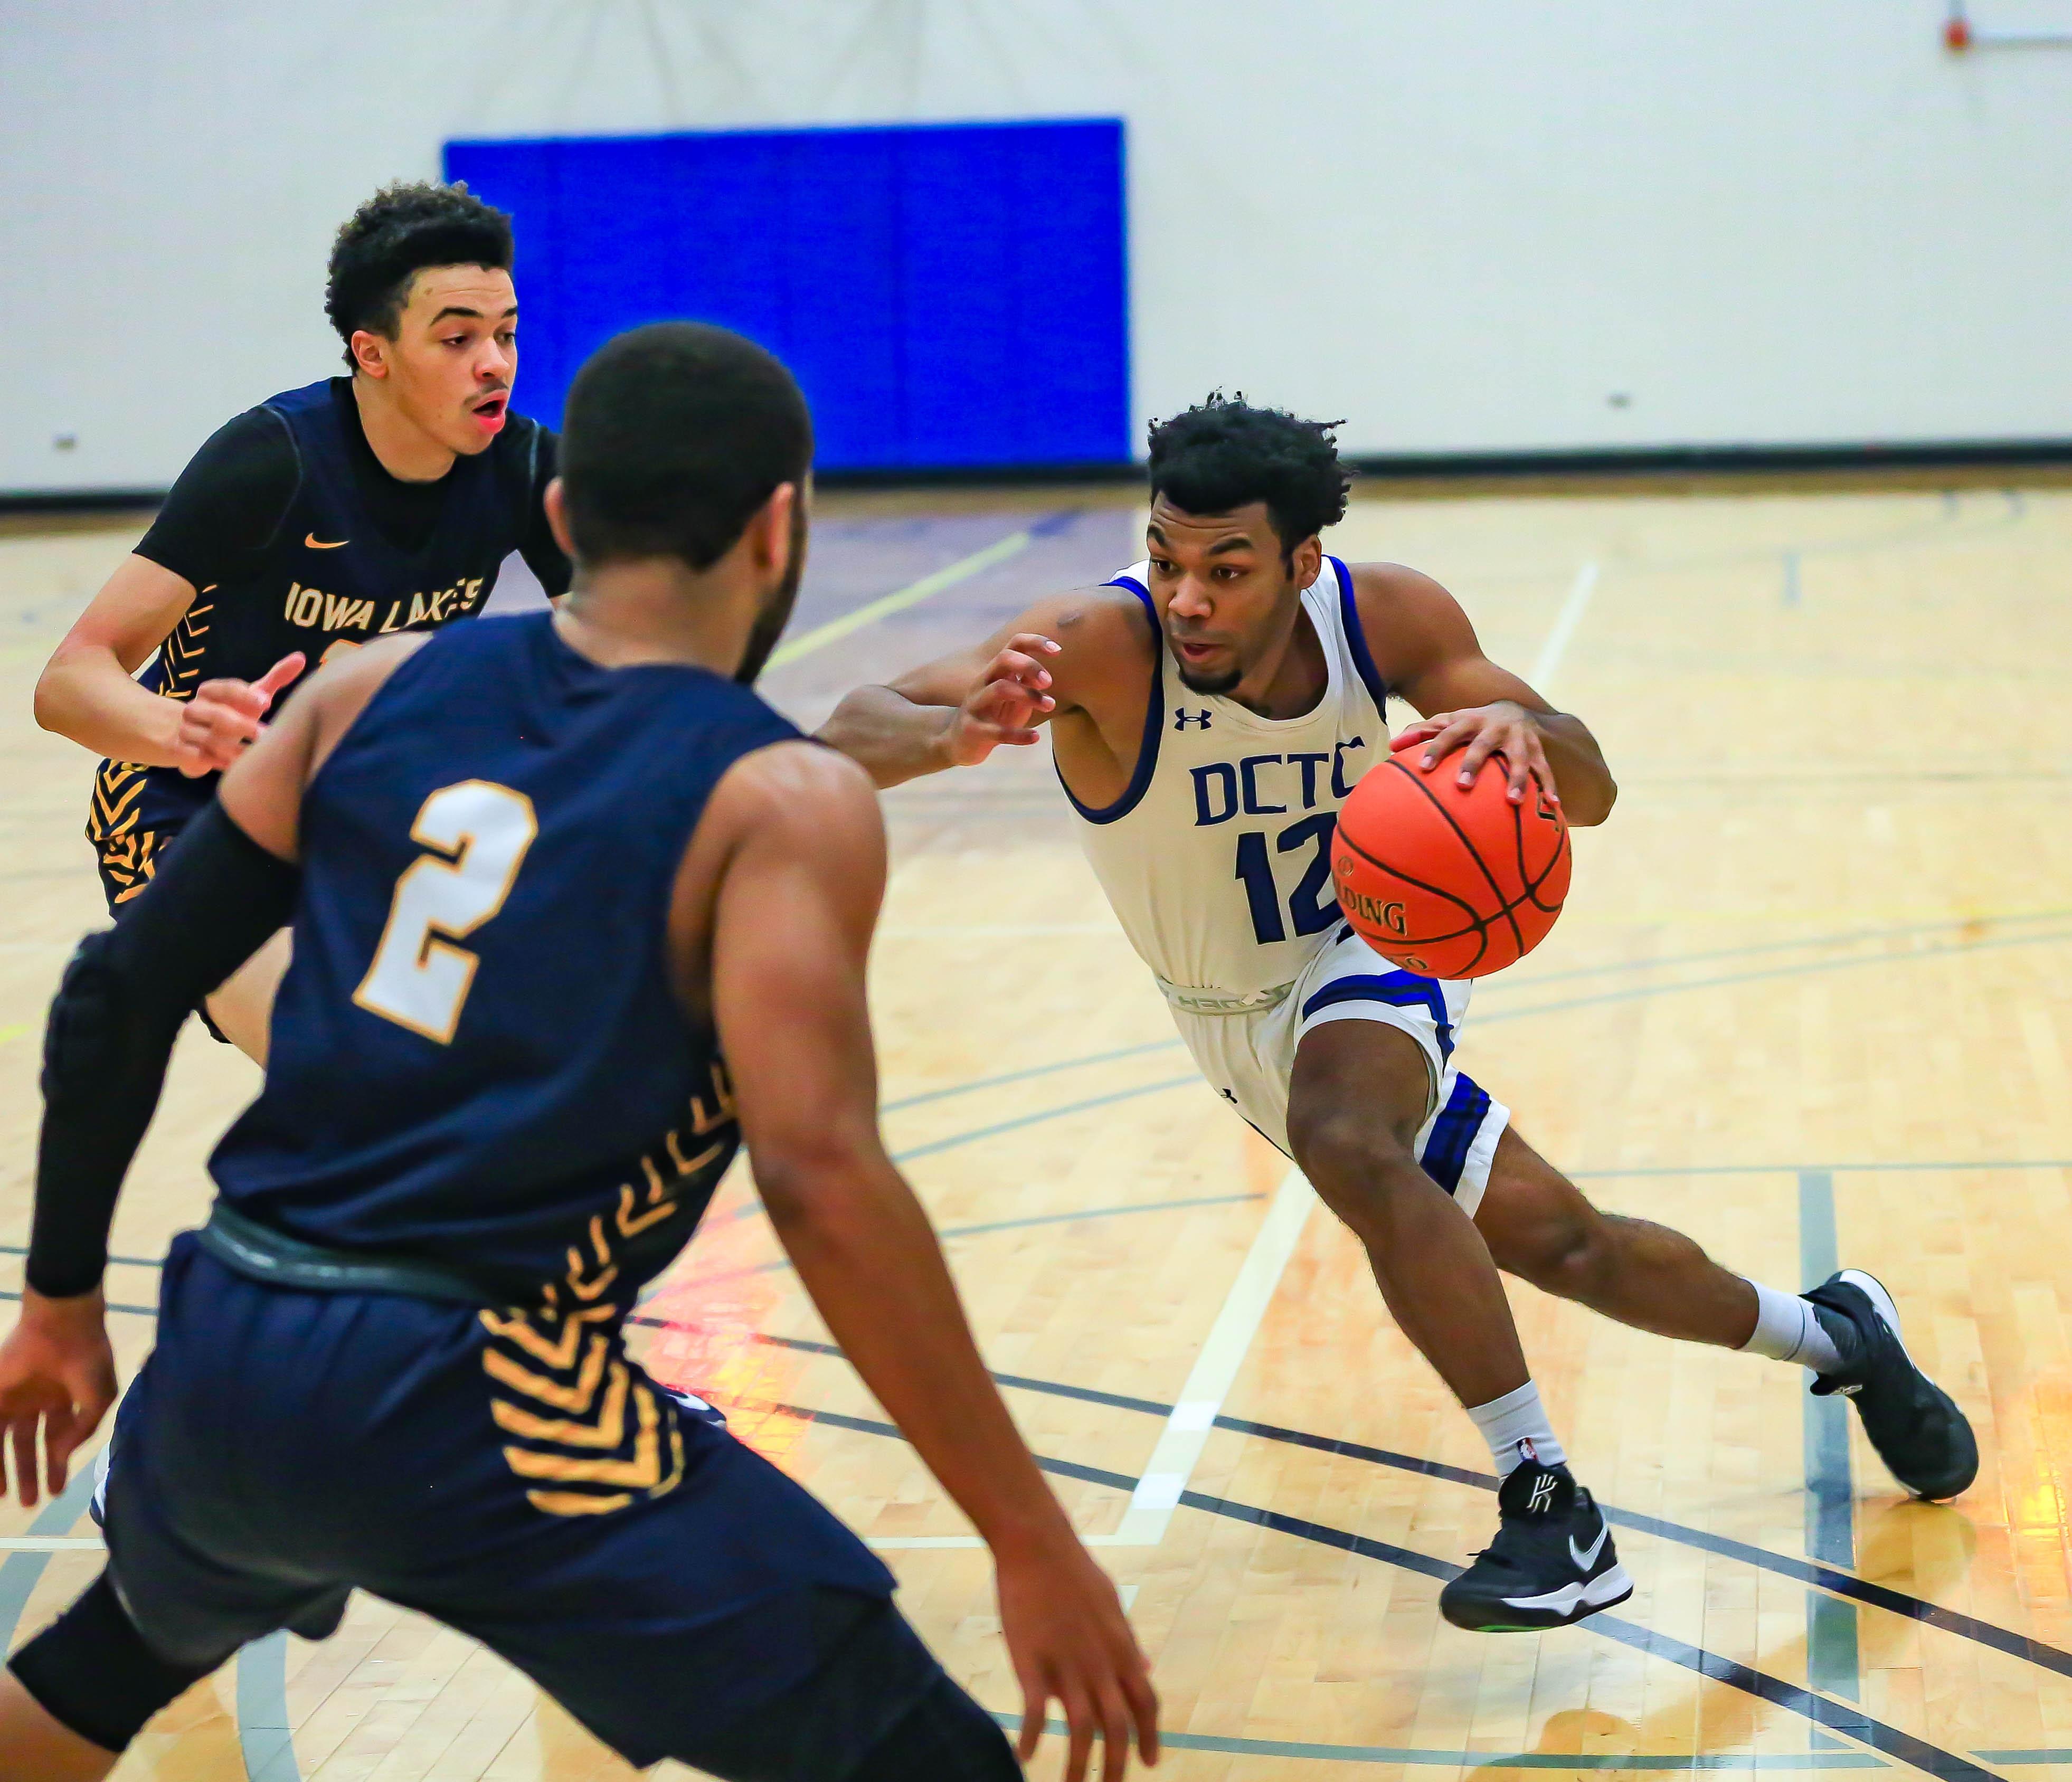 BK Basketball vs Iowa Lakes-150